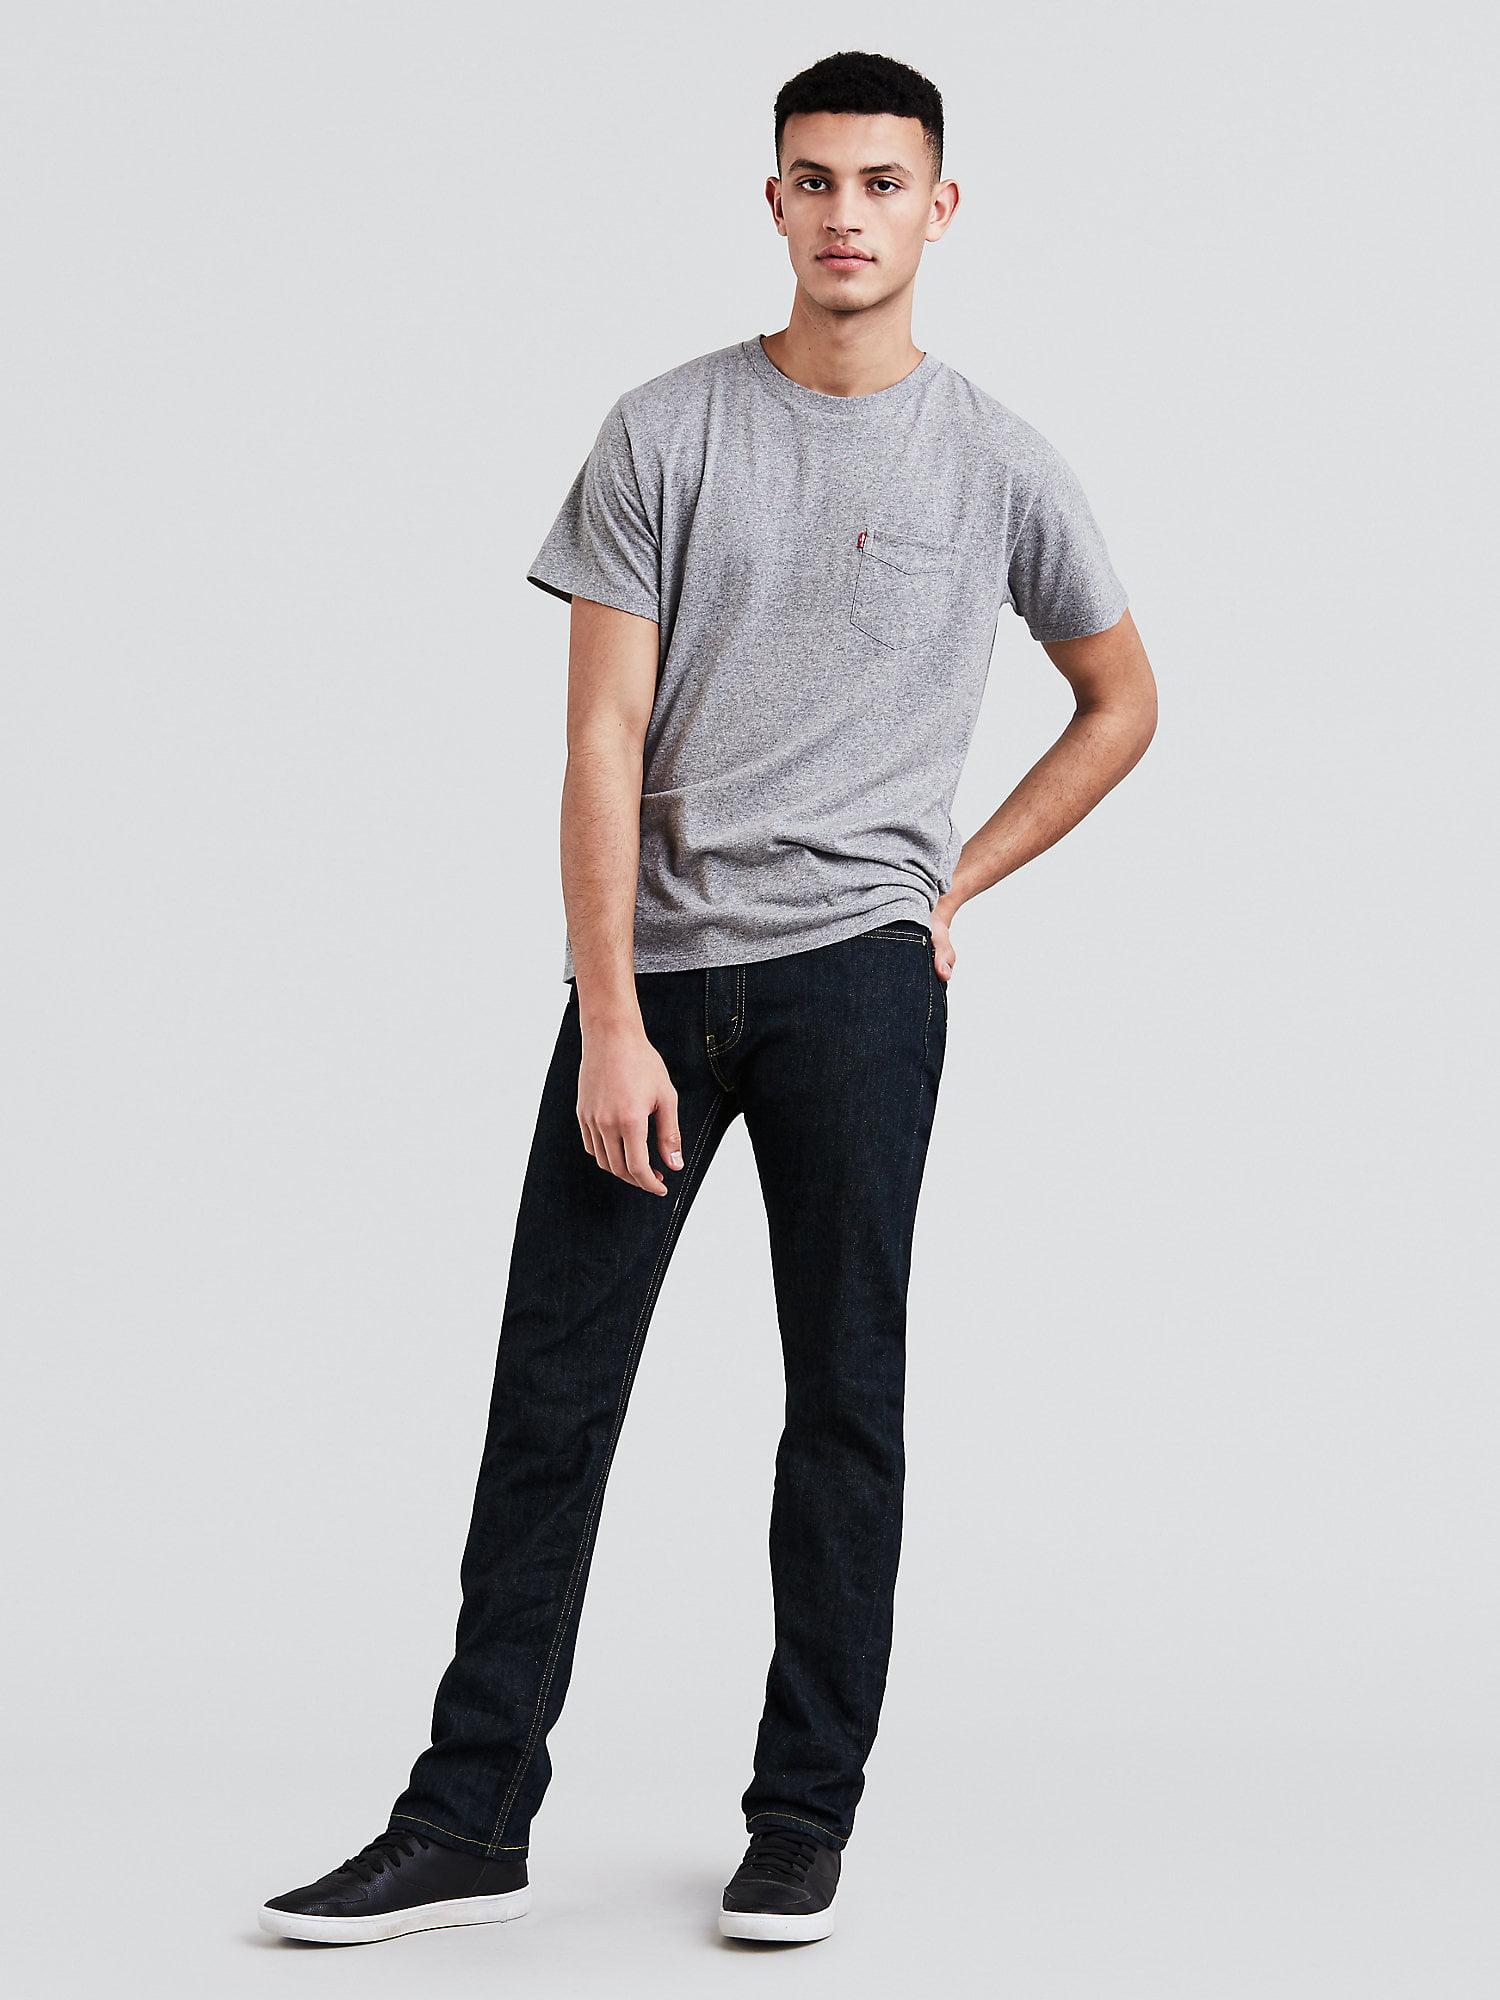 87d053c2 Levi's - Levi's Men's 513 Slim Straight Jeans - Walmart.com